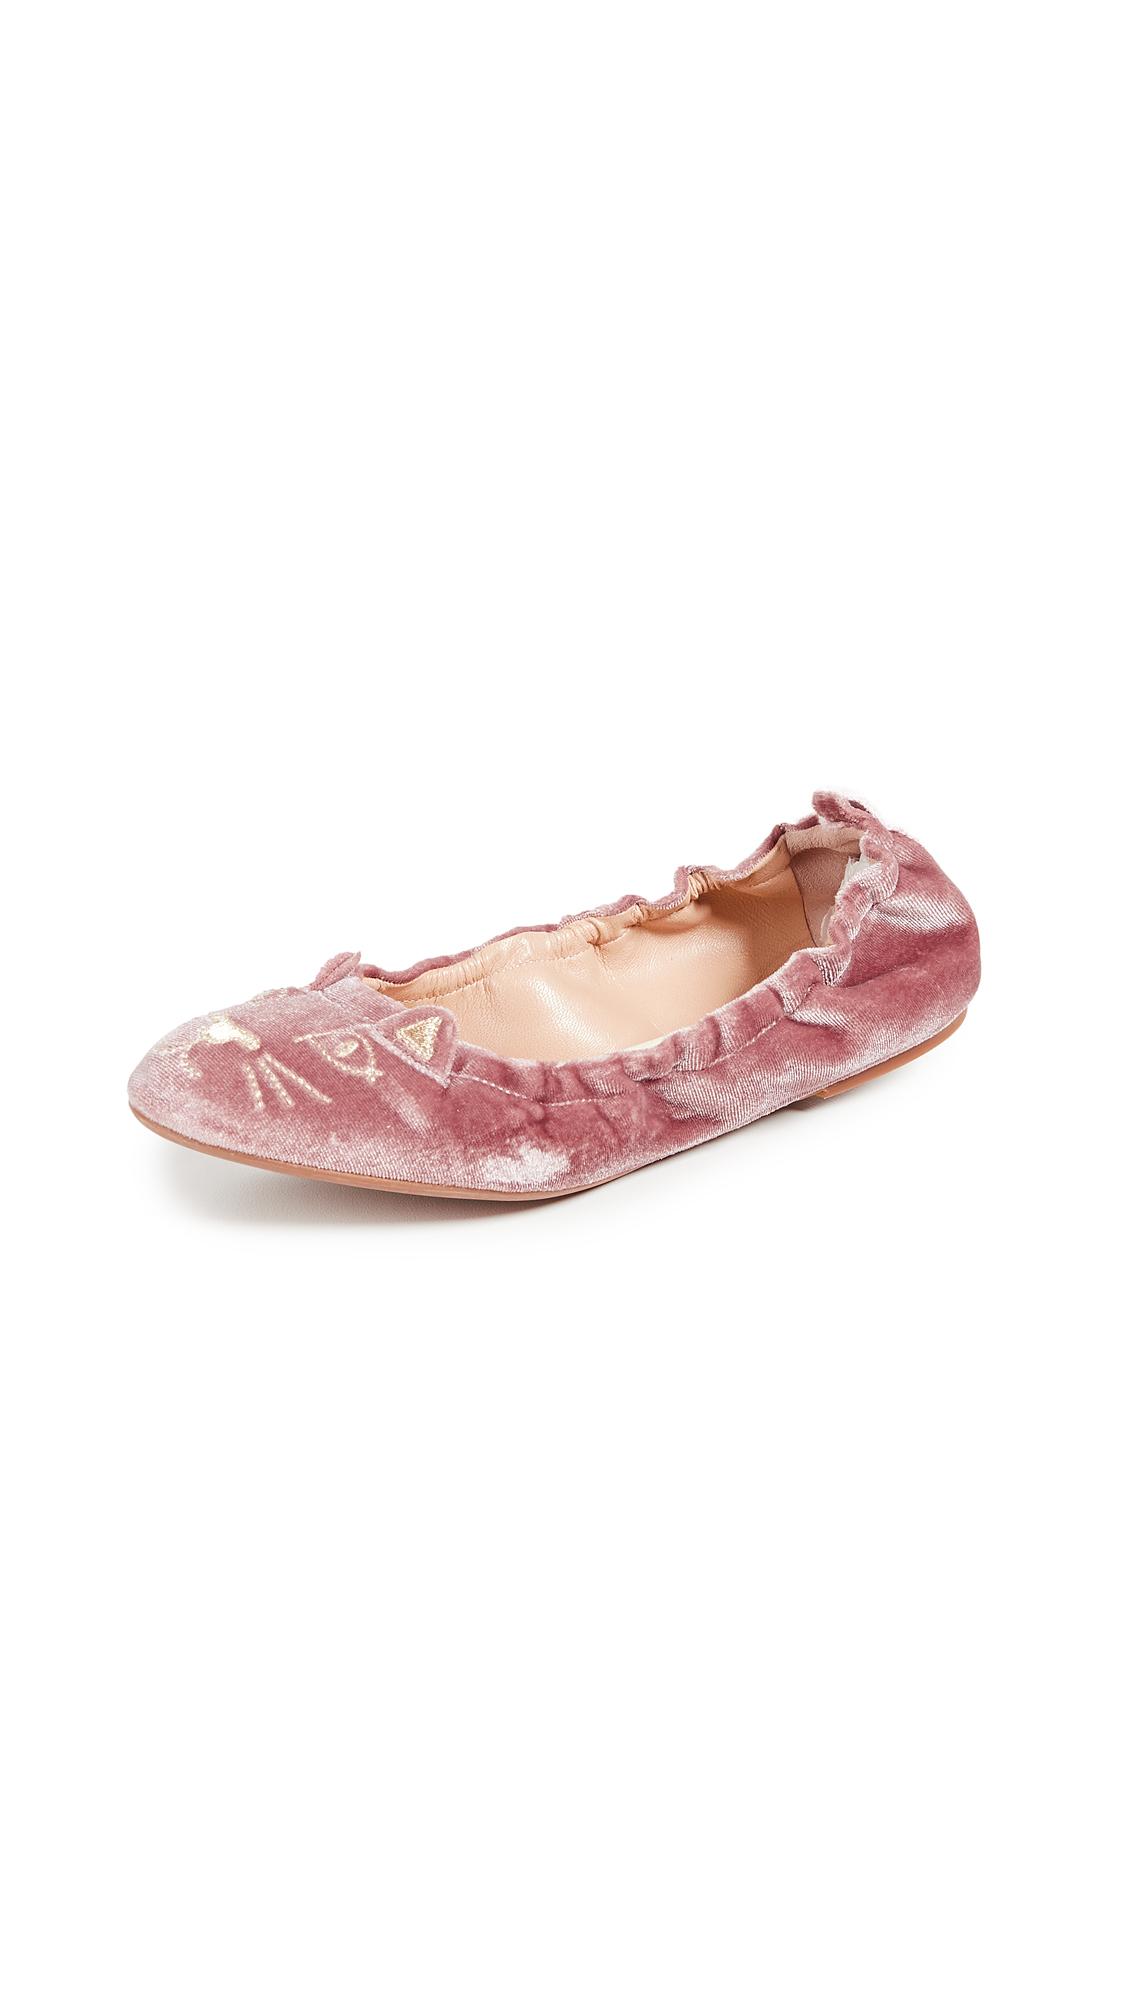 Charlotte Olympia Kitty Flats - Pink